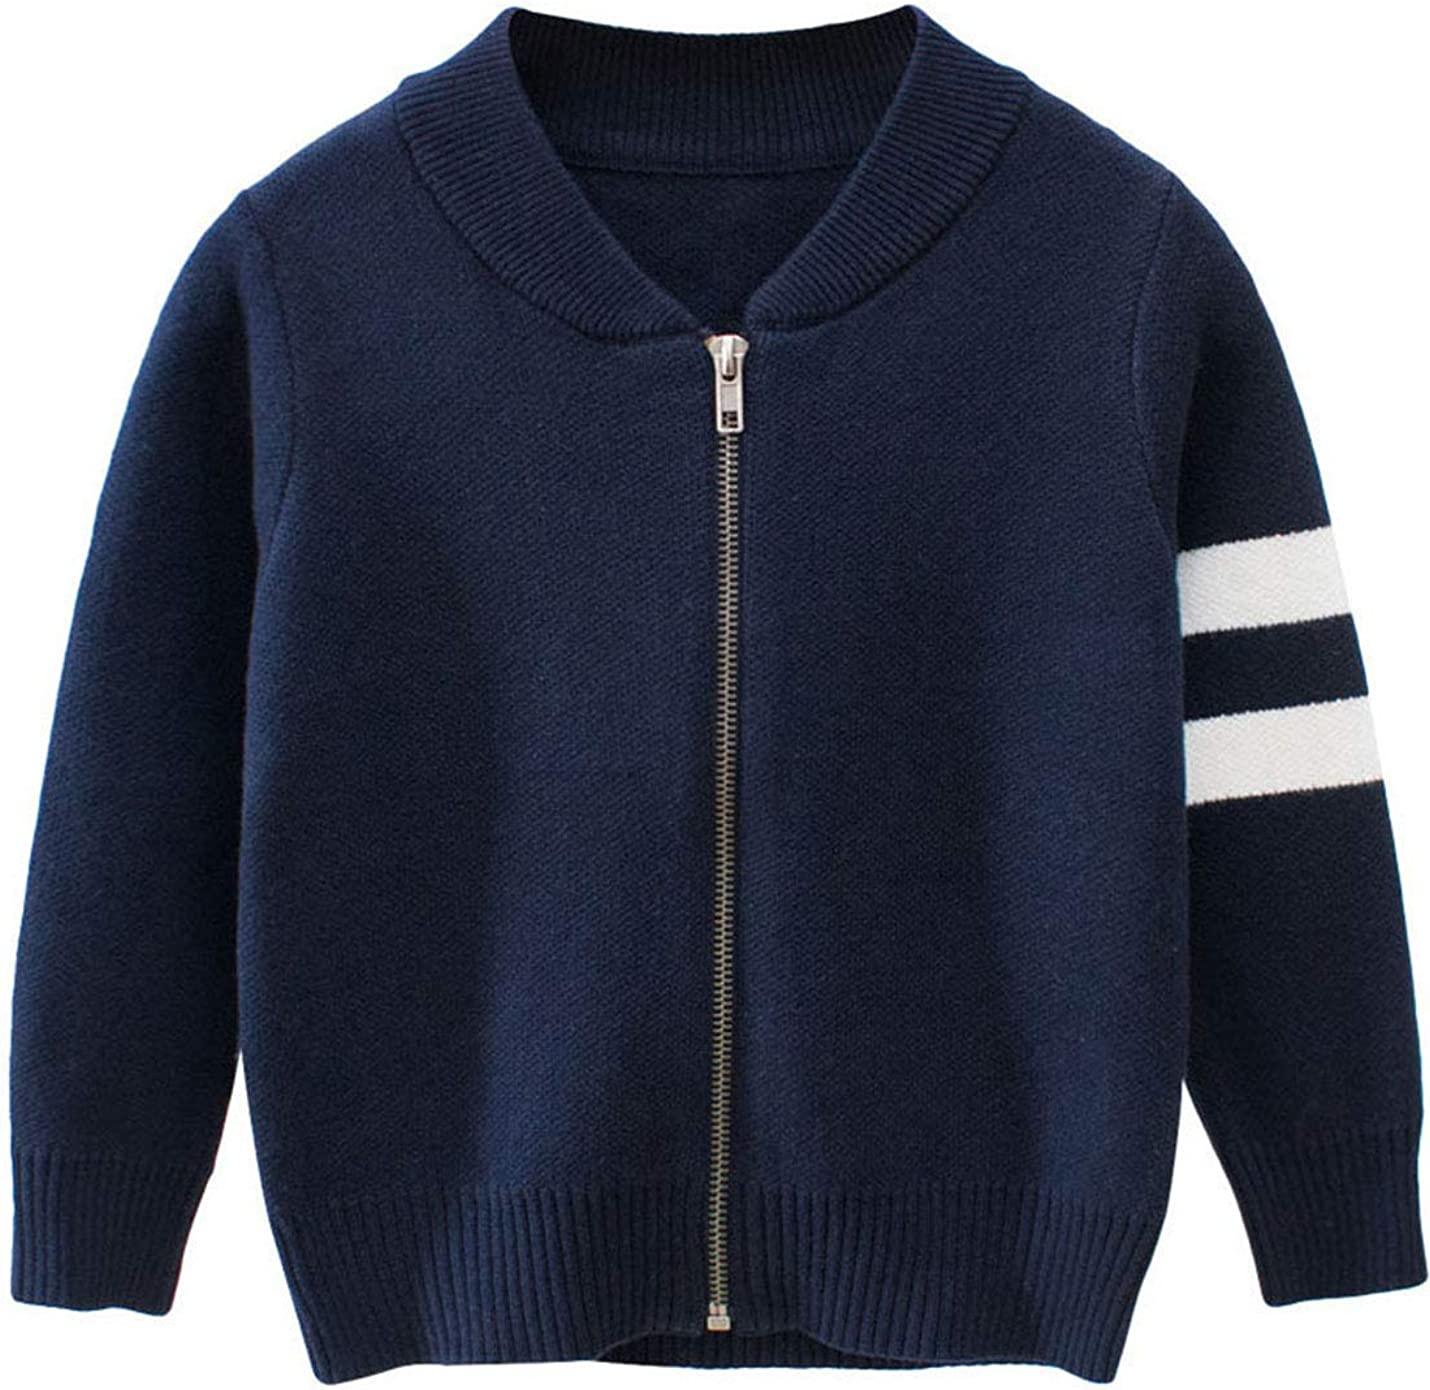 AMEBELLE Toddler Boy's Girl's Unisex Kint Sweater Zipper Bomber Jacket Cardigan